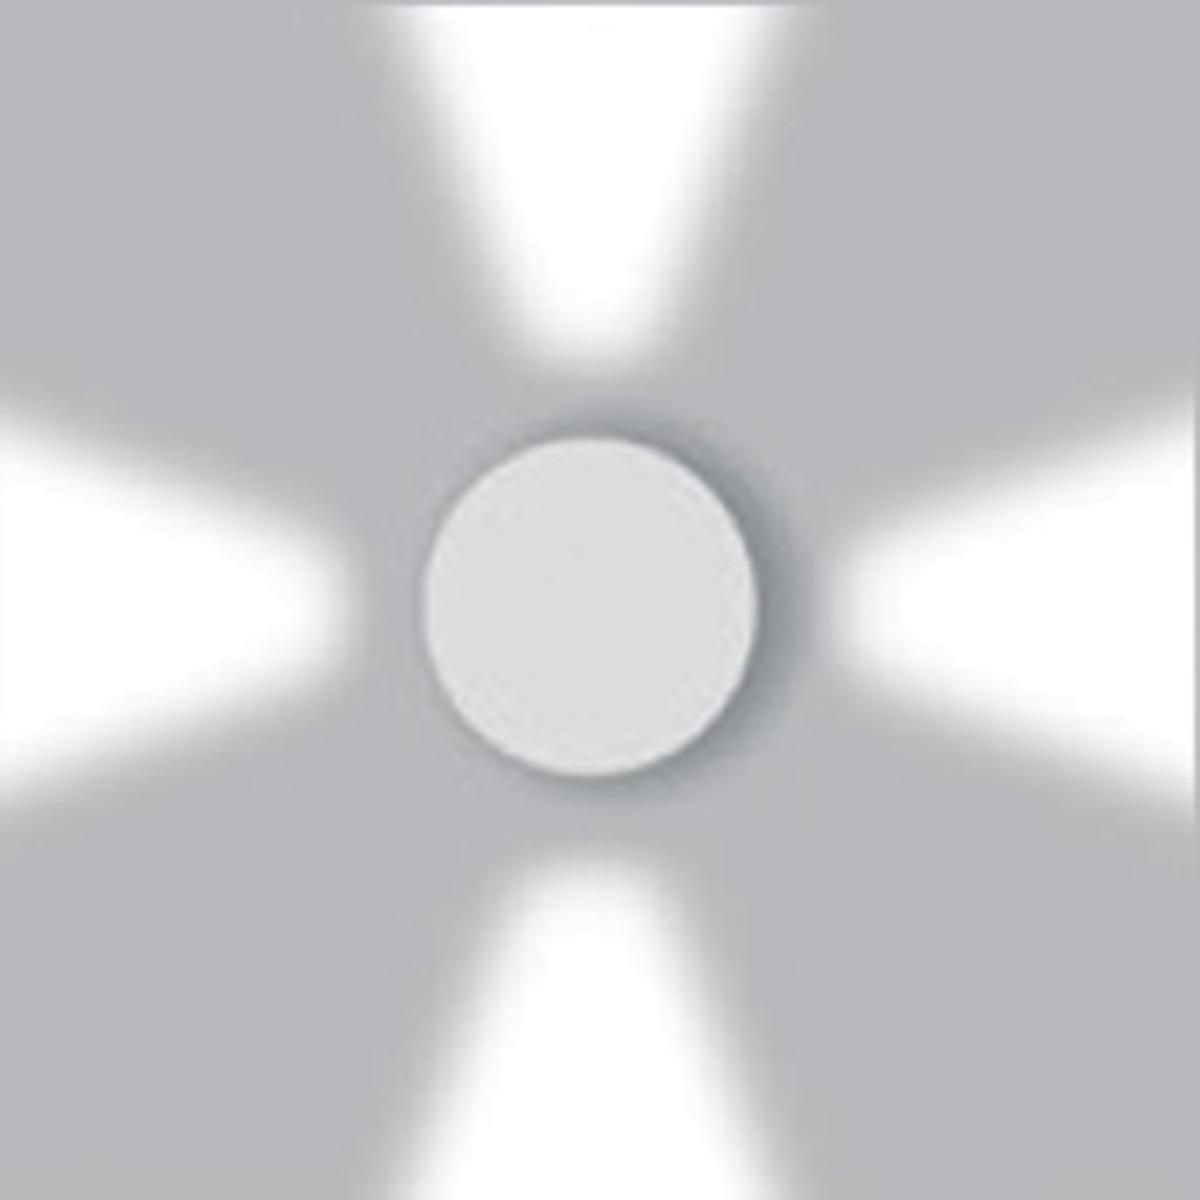 Artemide Outdoor Effetto 16R Wandleuchte 4L, 4 x 40°, hellgrau, 3000° K